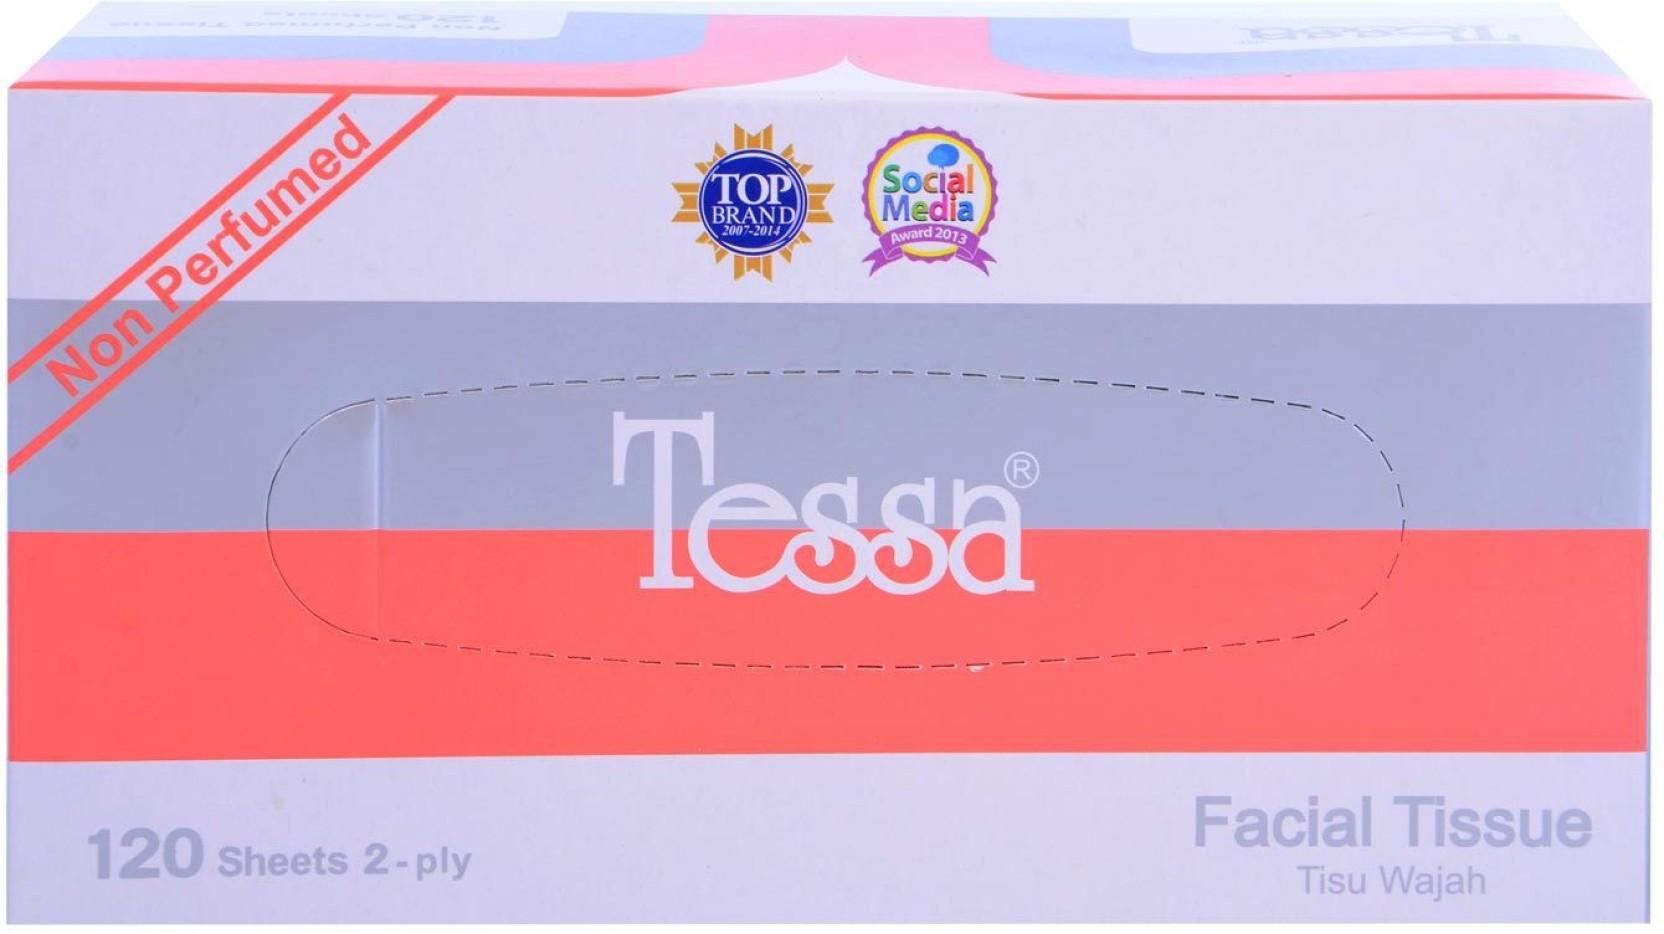 Harga Tissue Tisu Travel Paseo Terbaru 2018 Pack 50 Sheets 2 Ply Tessa Tm 05 Price In India Buy Online Add To Cart